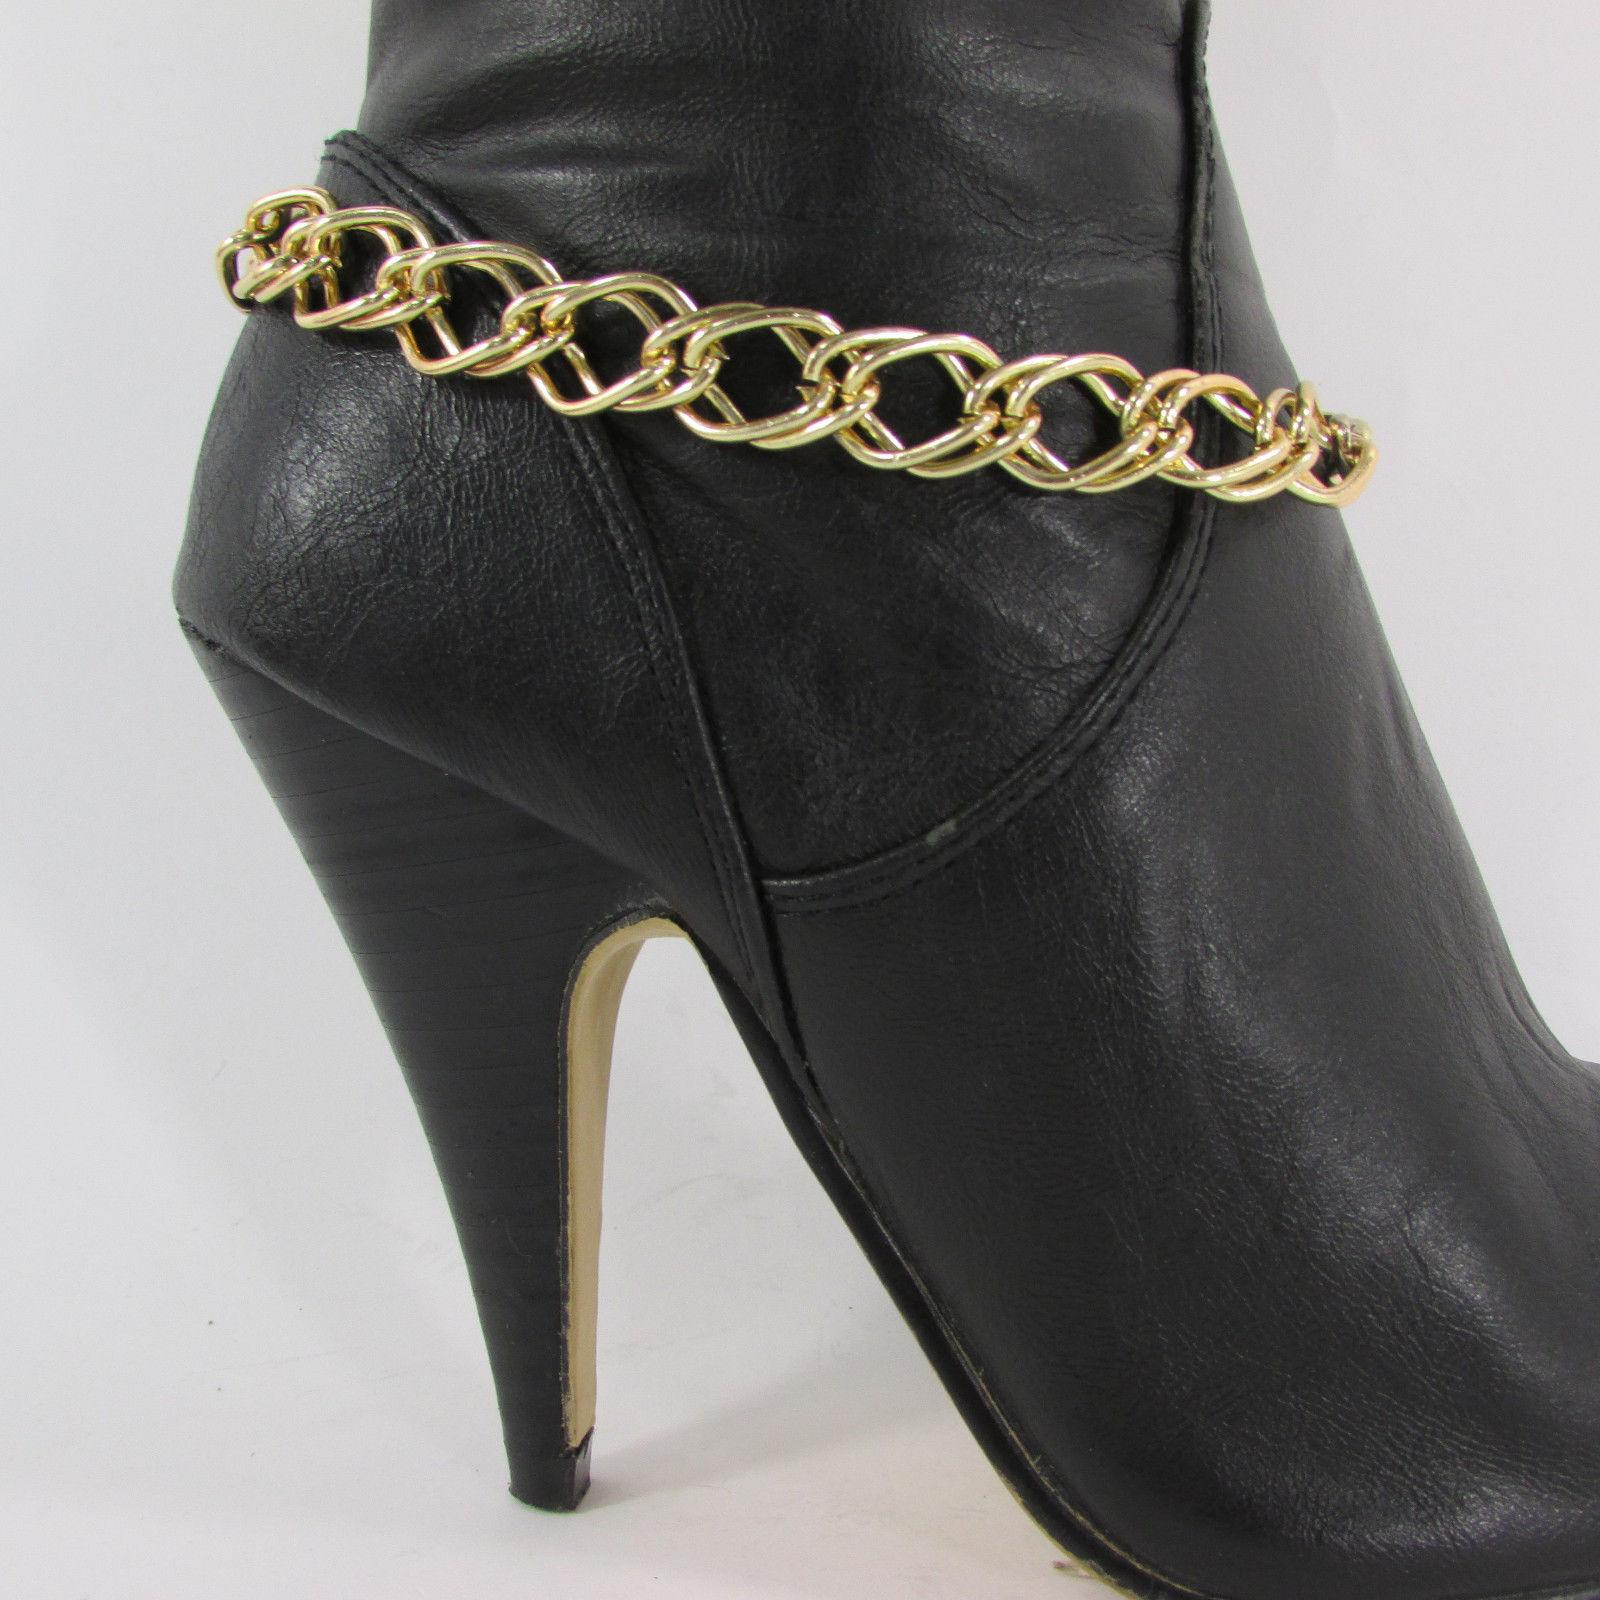 New Women Fashion Jewelry Boot Bracelet Gold Chunky Chain Links Shoe Bling Charm